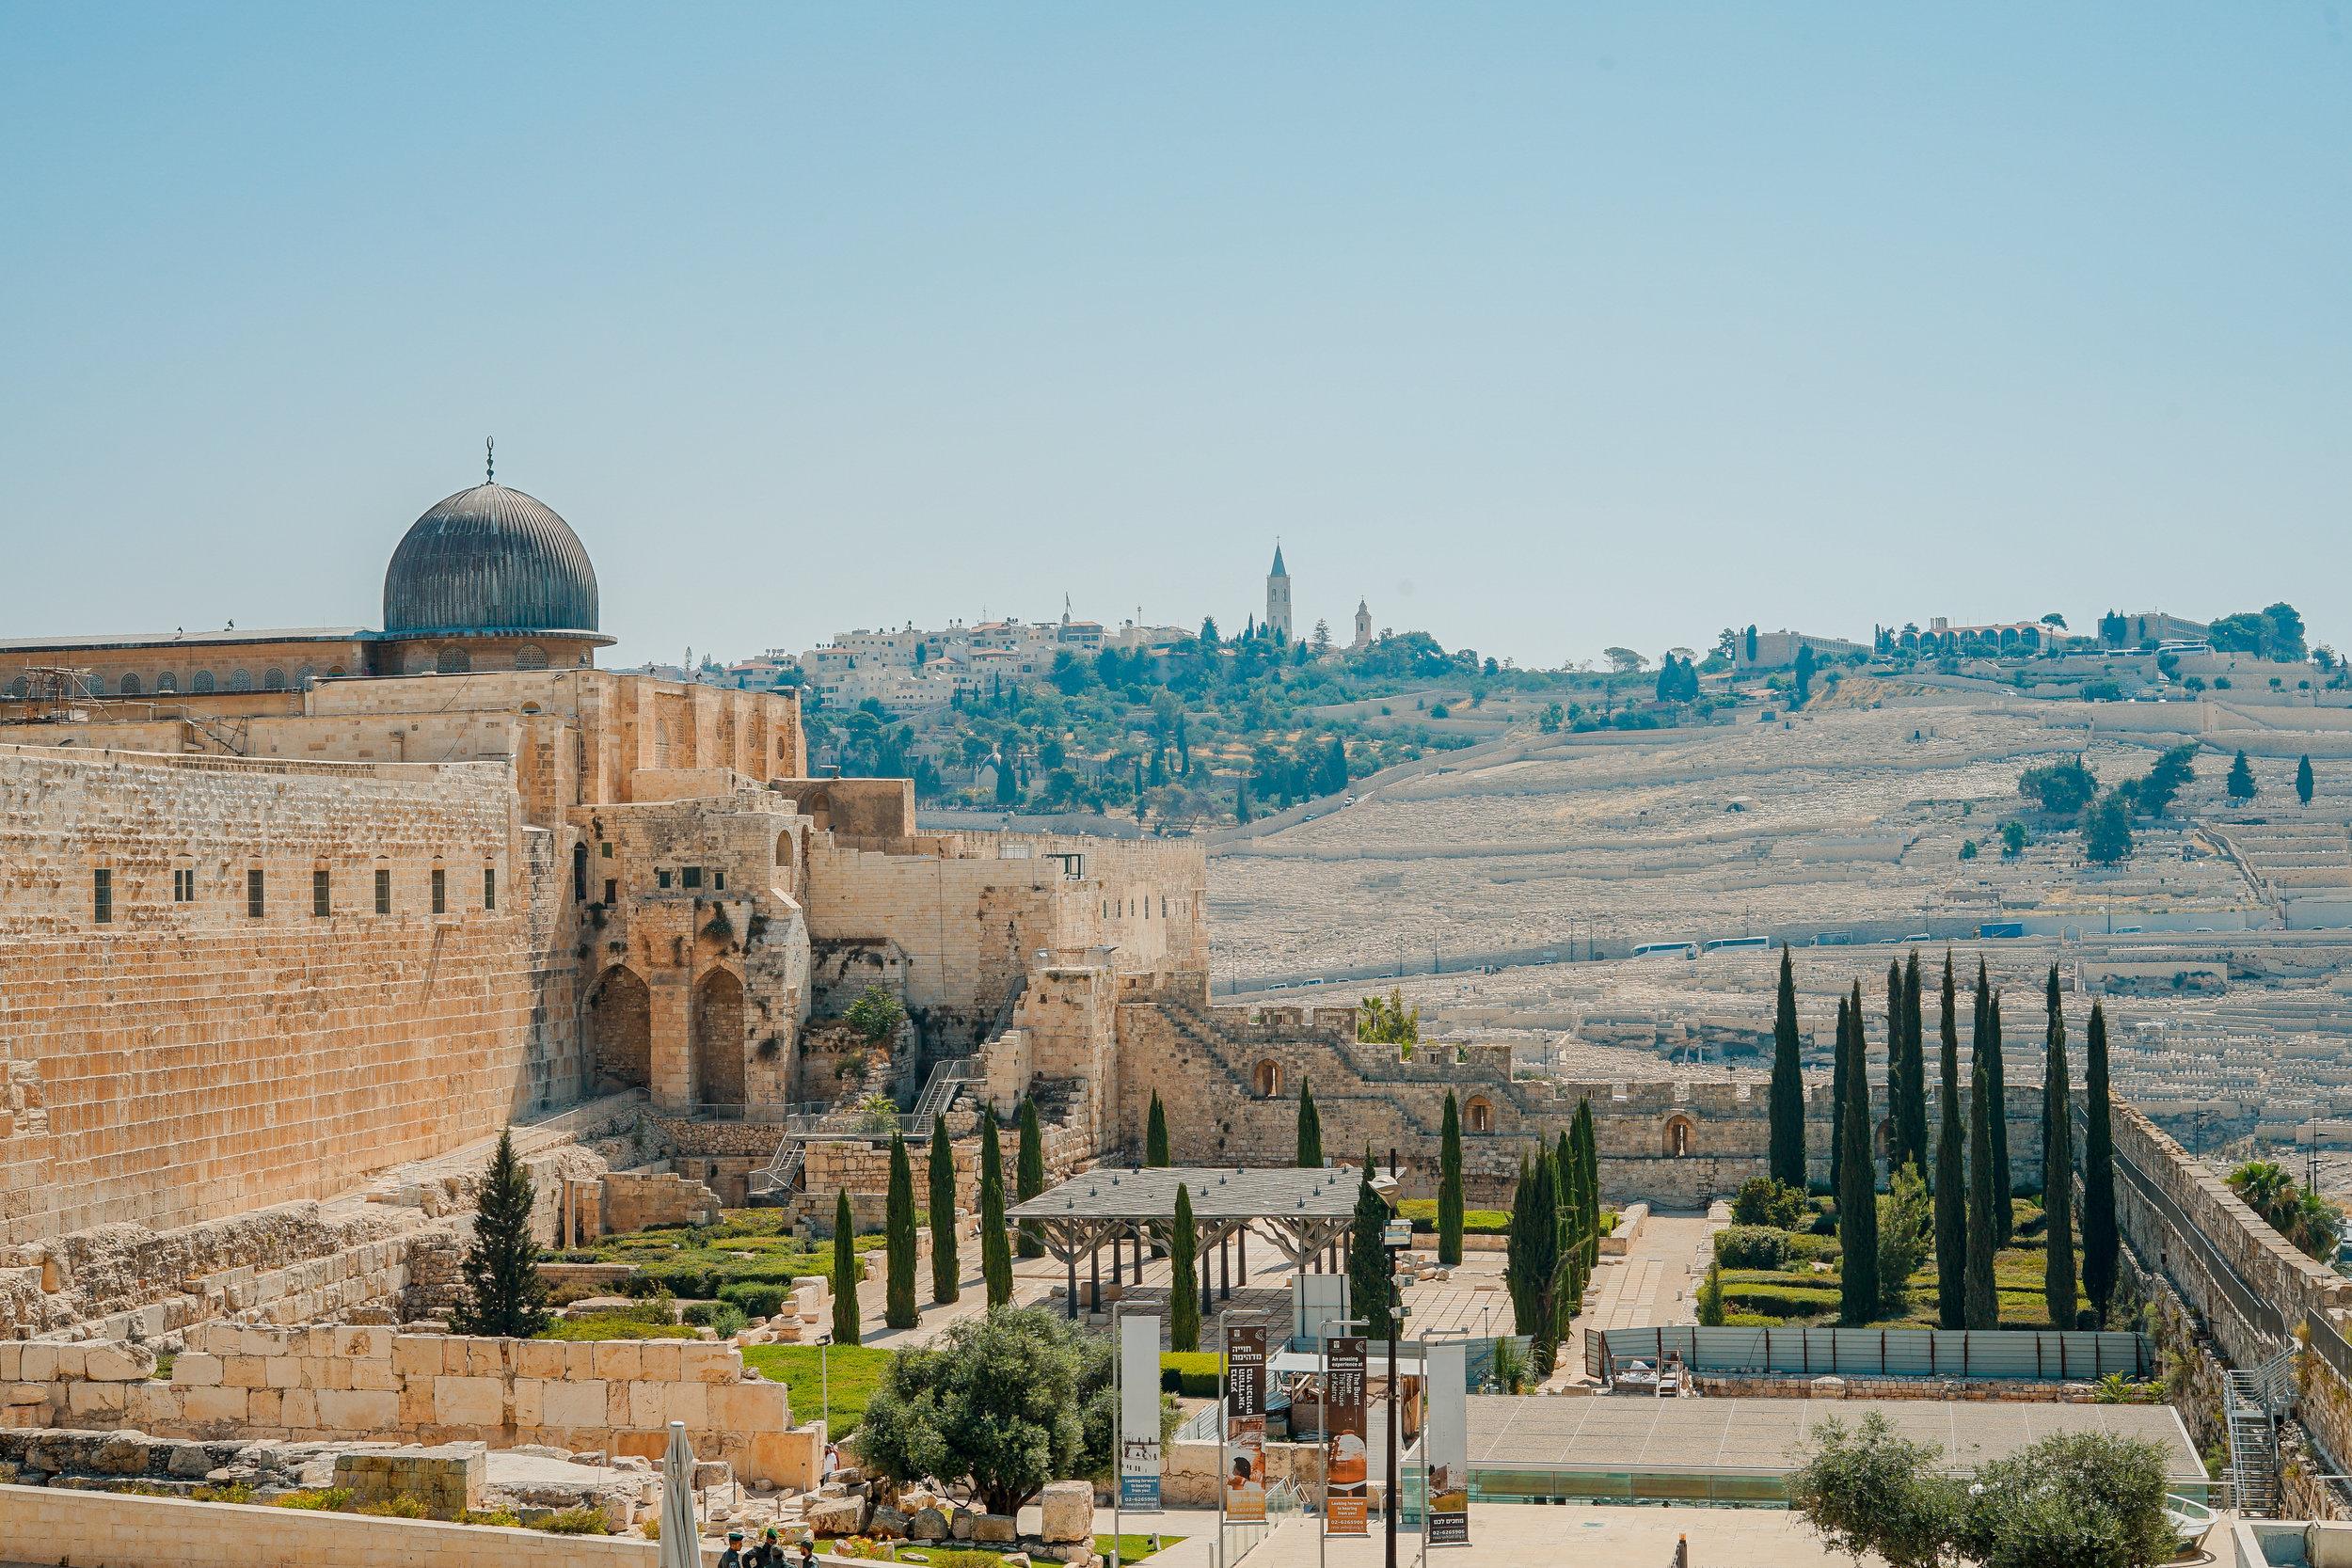 FEBRUARY 27 - MARCH 8, 2020 - Israel & Jordan